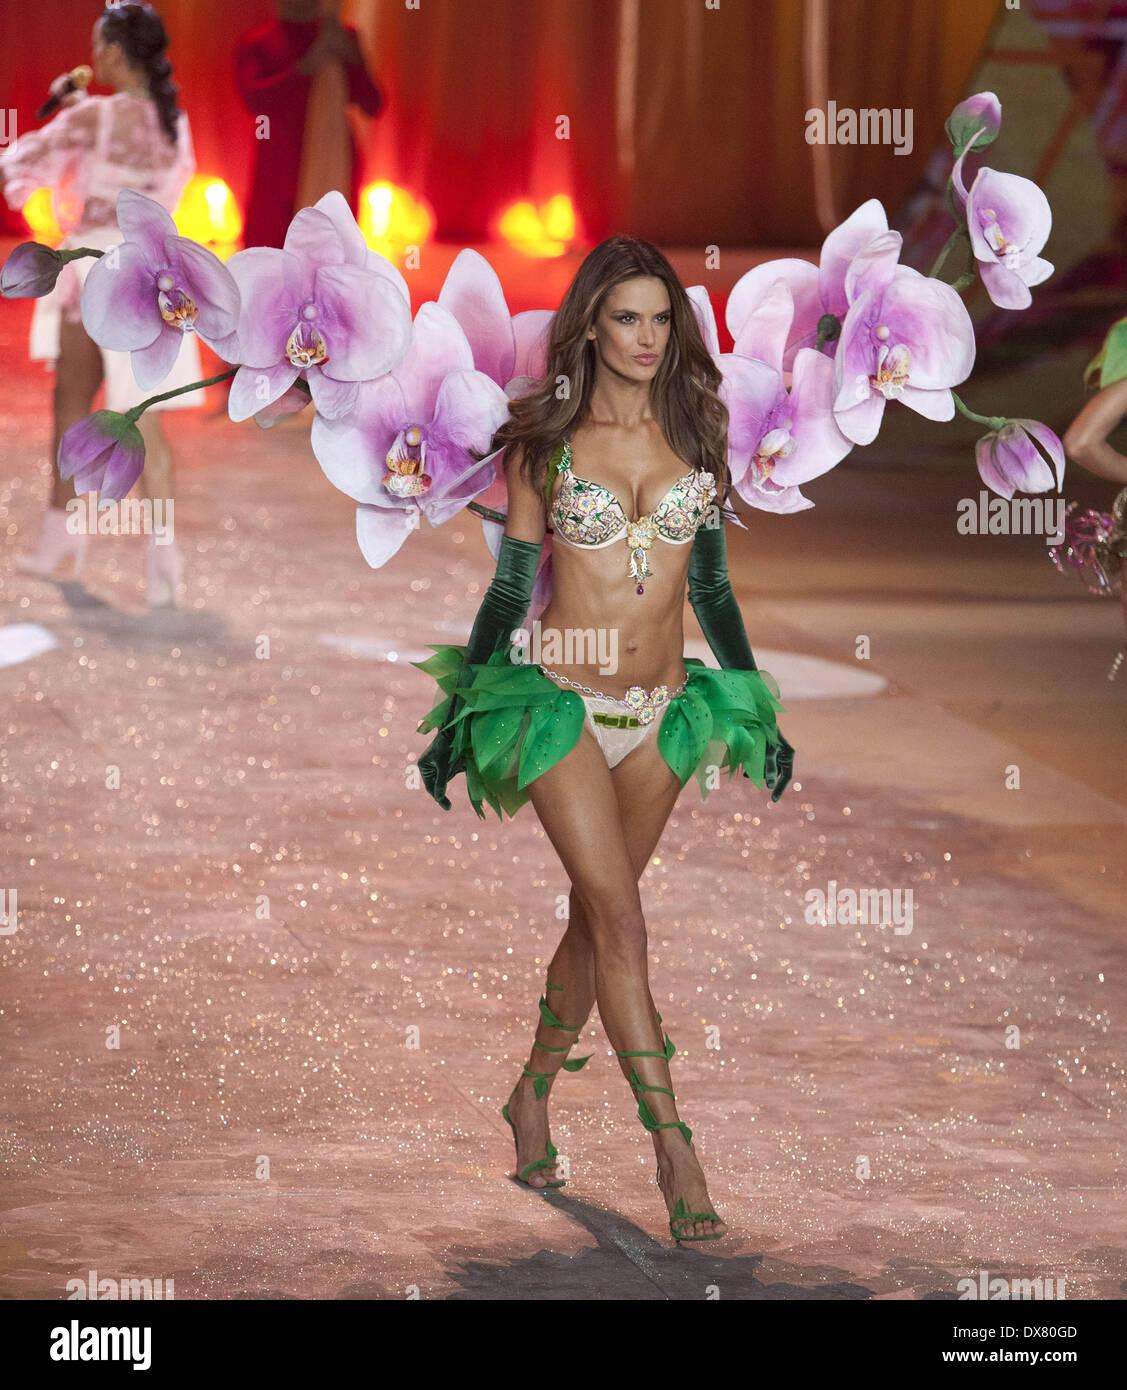 5008a3279e Alessandra Ambrosio at the Victoria Secret Fashion Show 2012 Lexington  Avenue Armory Featuring  Alessandra Ambrosio